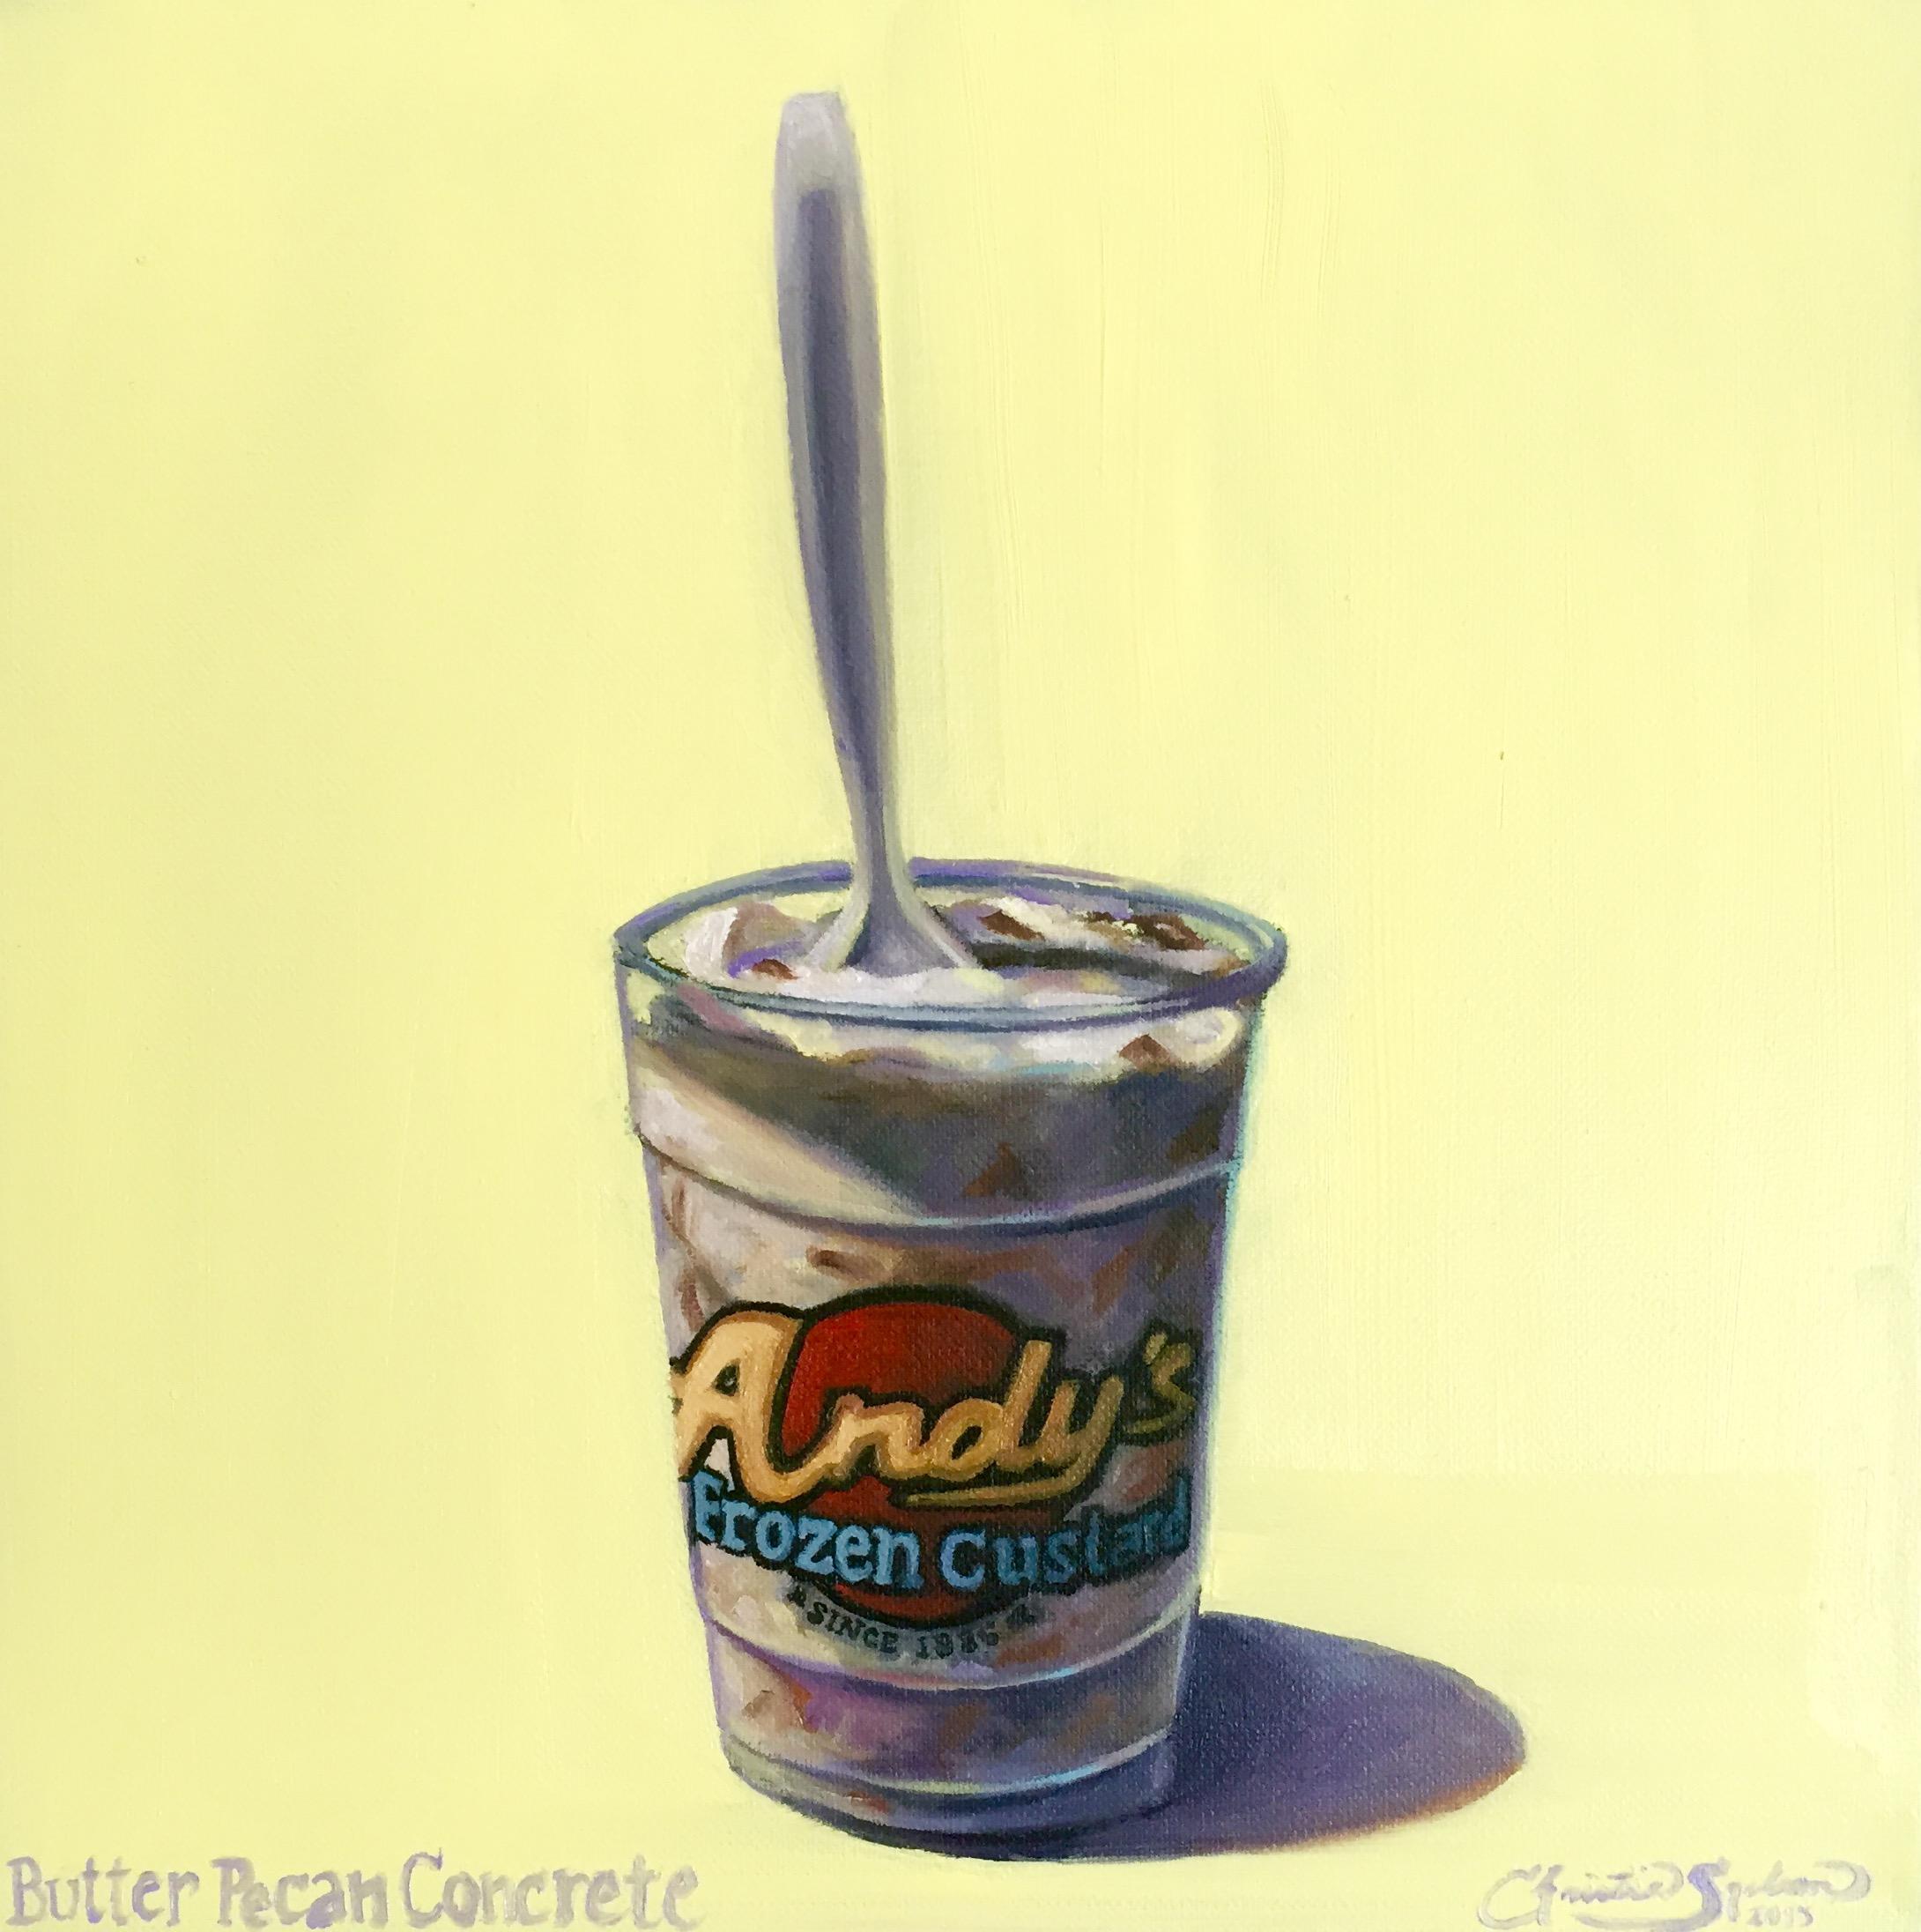 Andys Frozen Custard_Butter Pecan Concrete_Christie Snelson.jpg